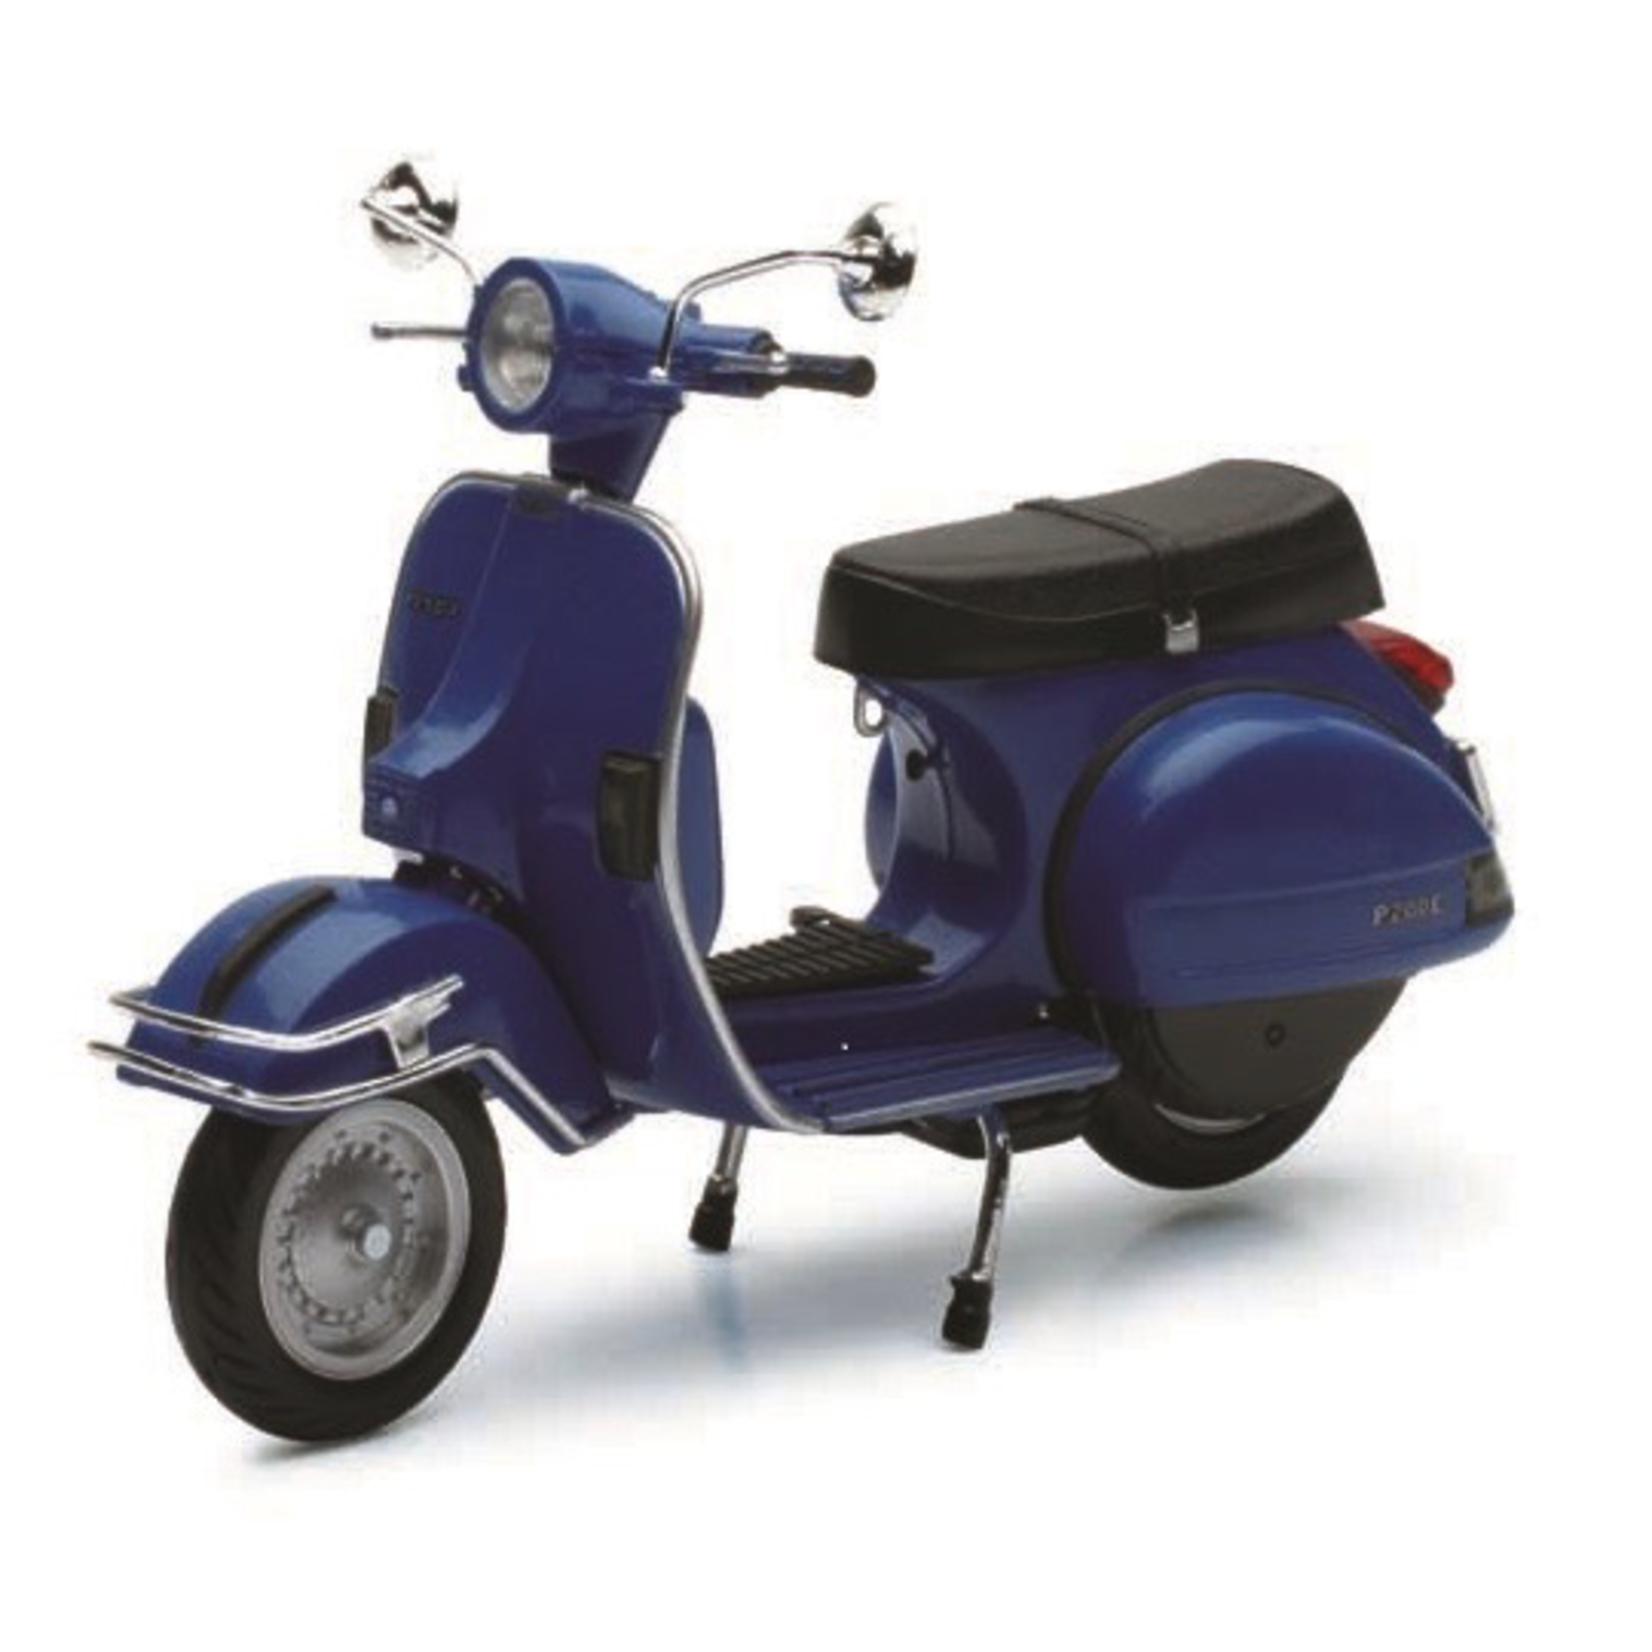 Lifestyle Toy, 1978 Vespa P200E 1:12 Blue